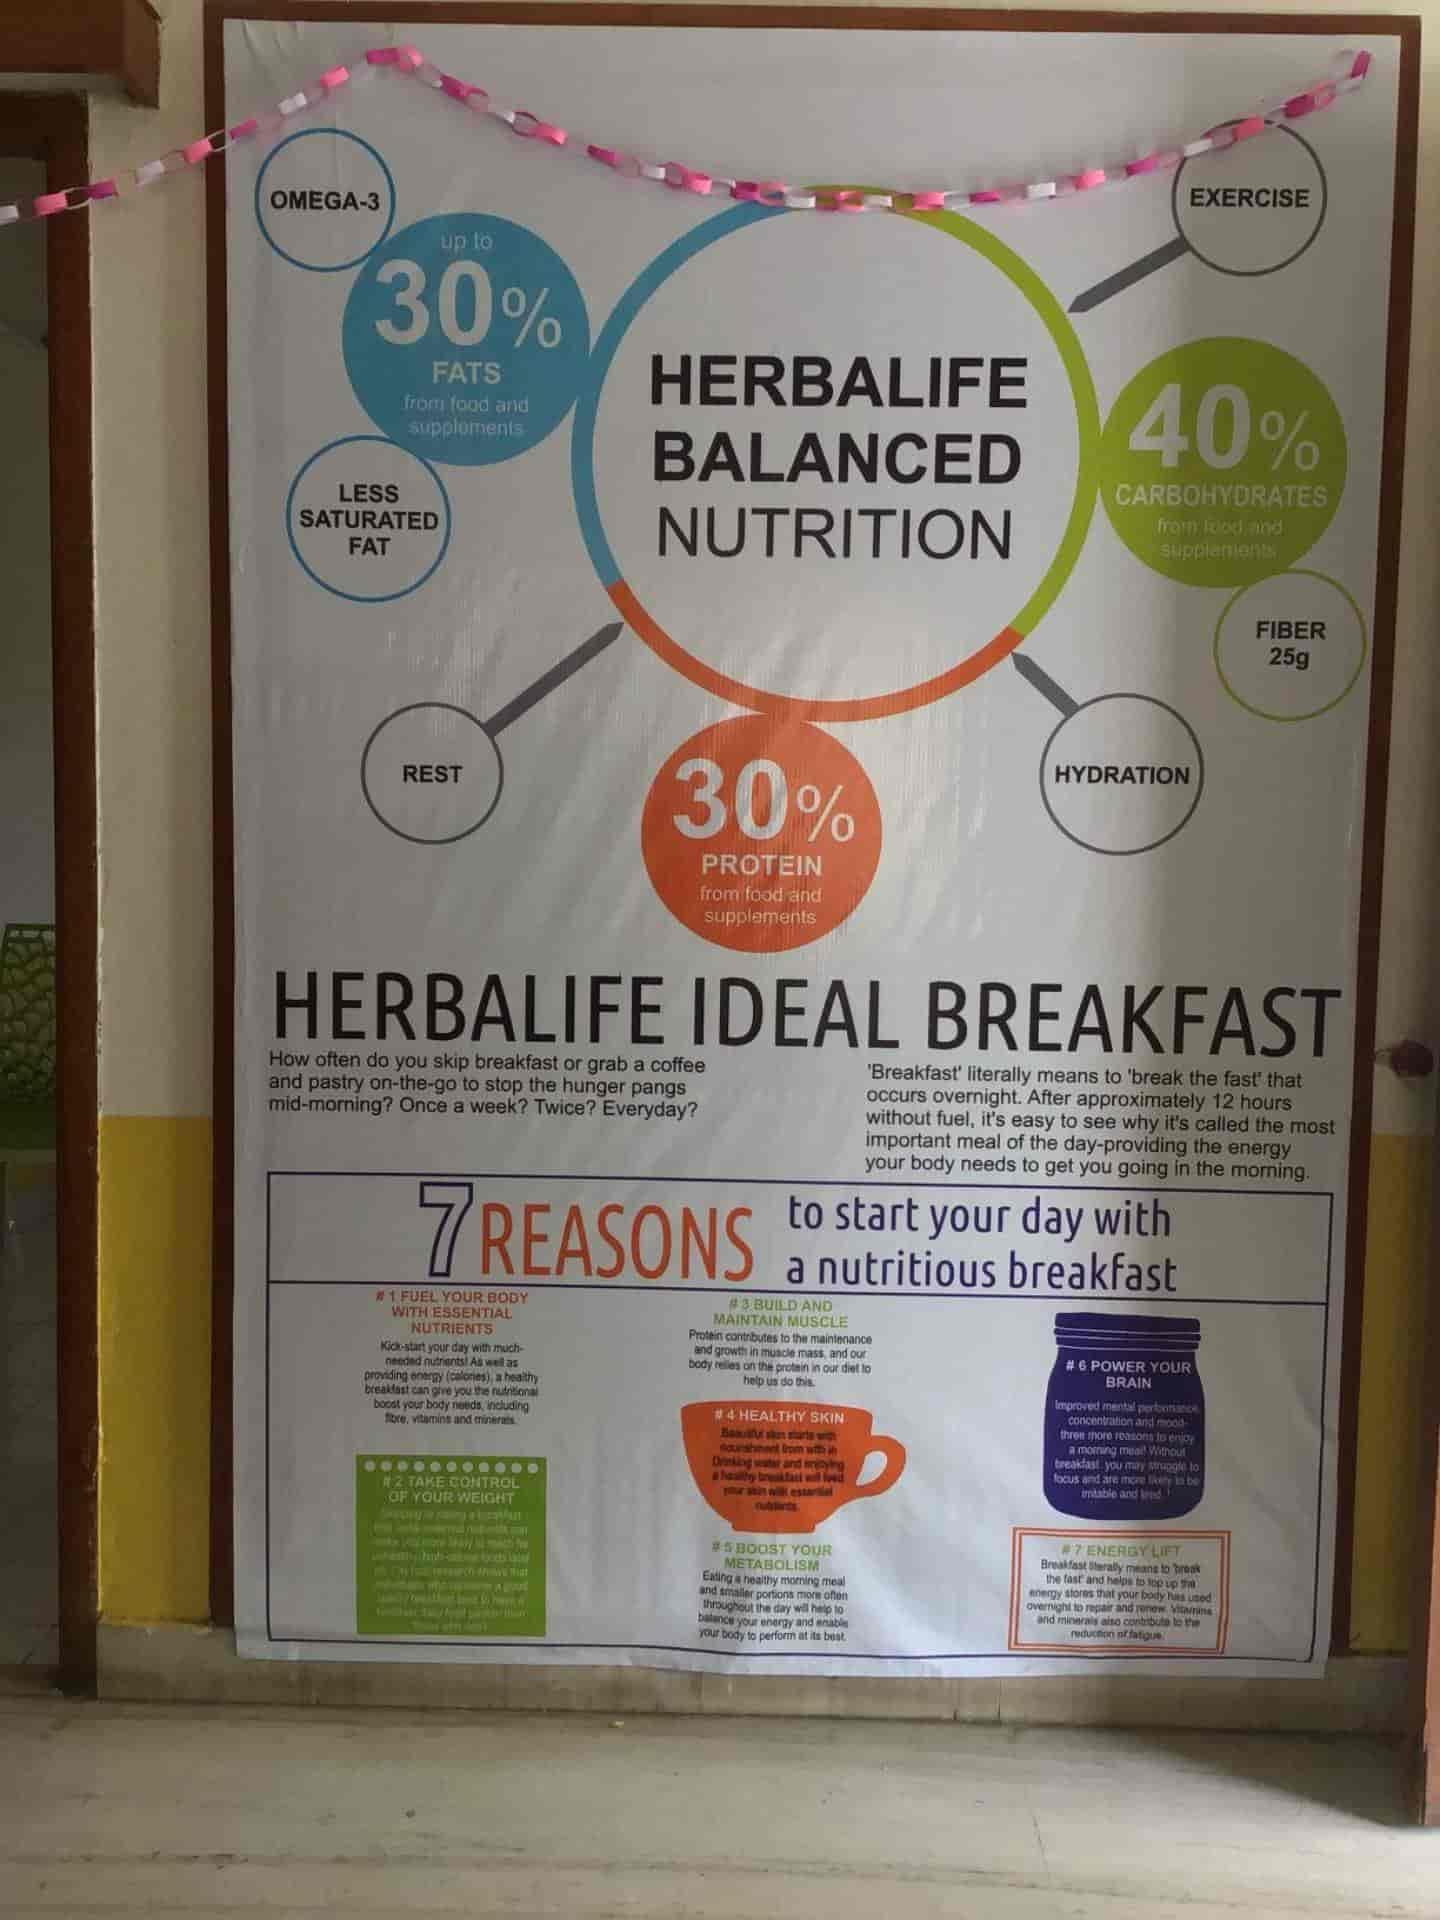 Go Healthy Nutrition Center Photos, KPHB Colony, Hyderabad- Pictures